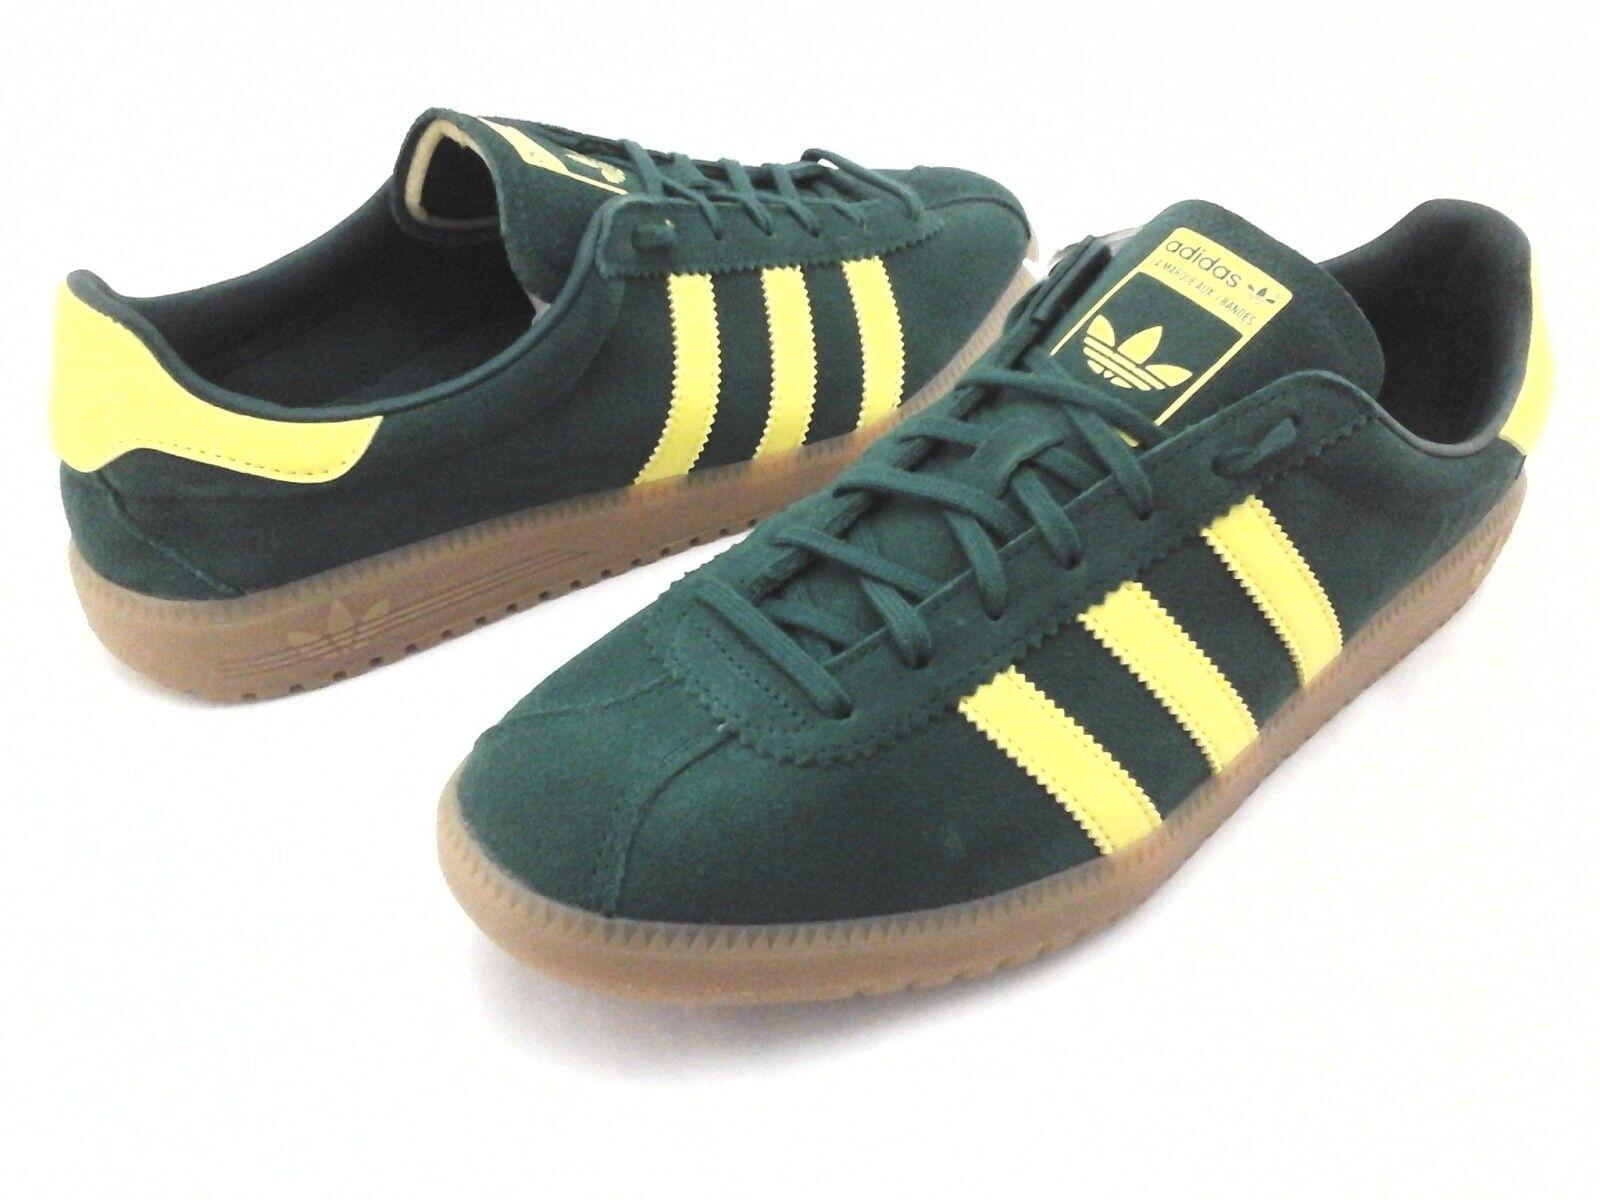 Adidas BERMUDA shoes Green Suede Yellow Gum Sole Retro B41472 Men's US 11 45 1 3